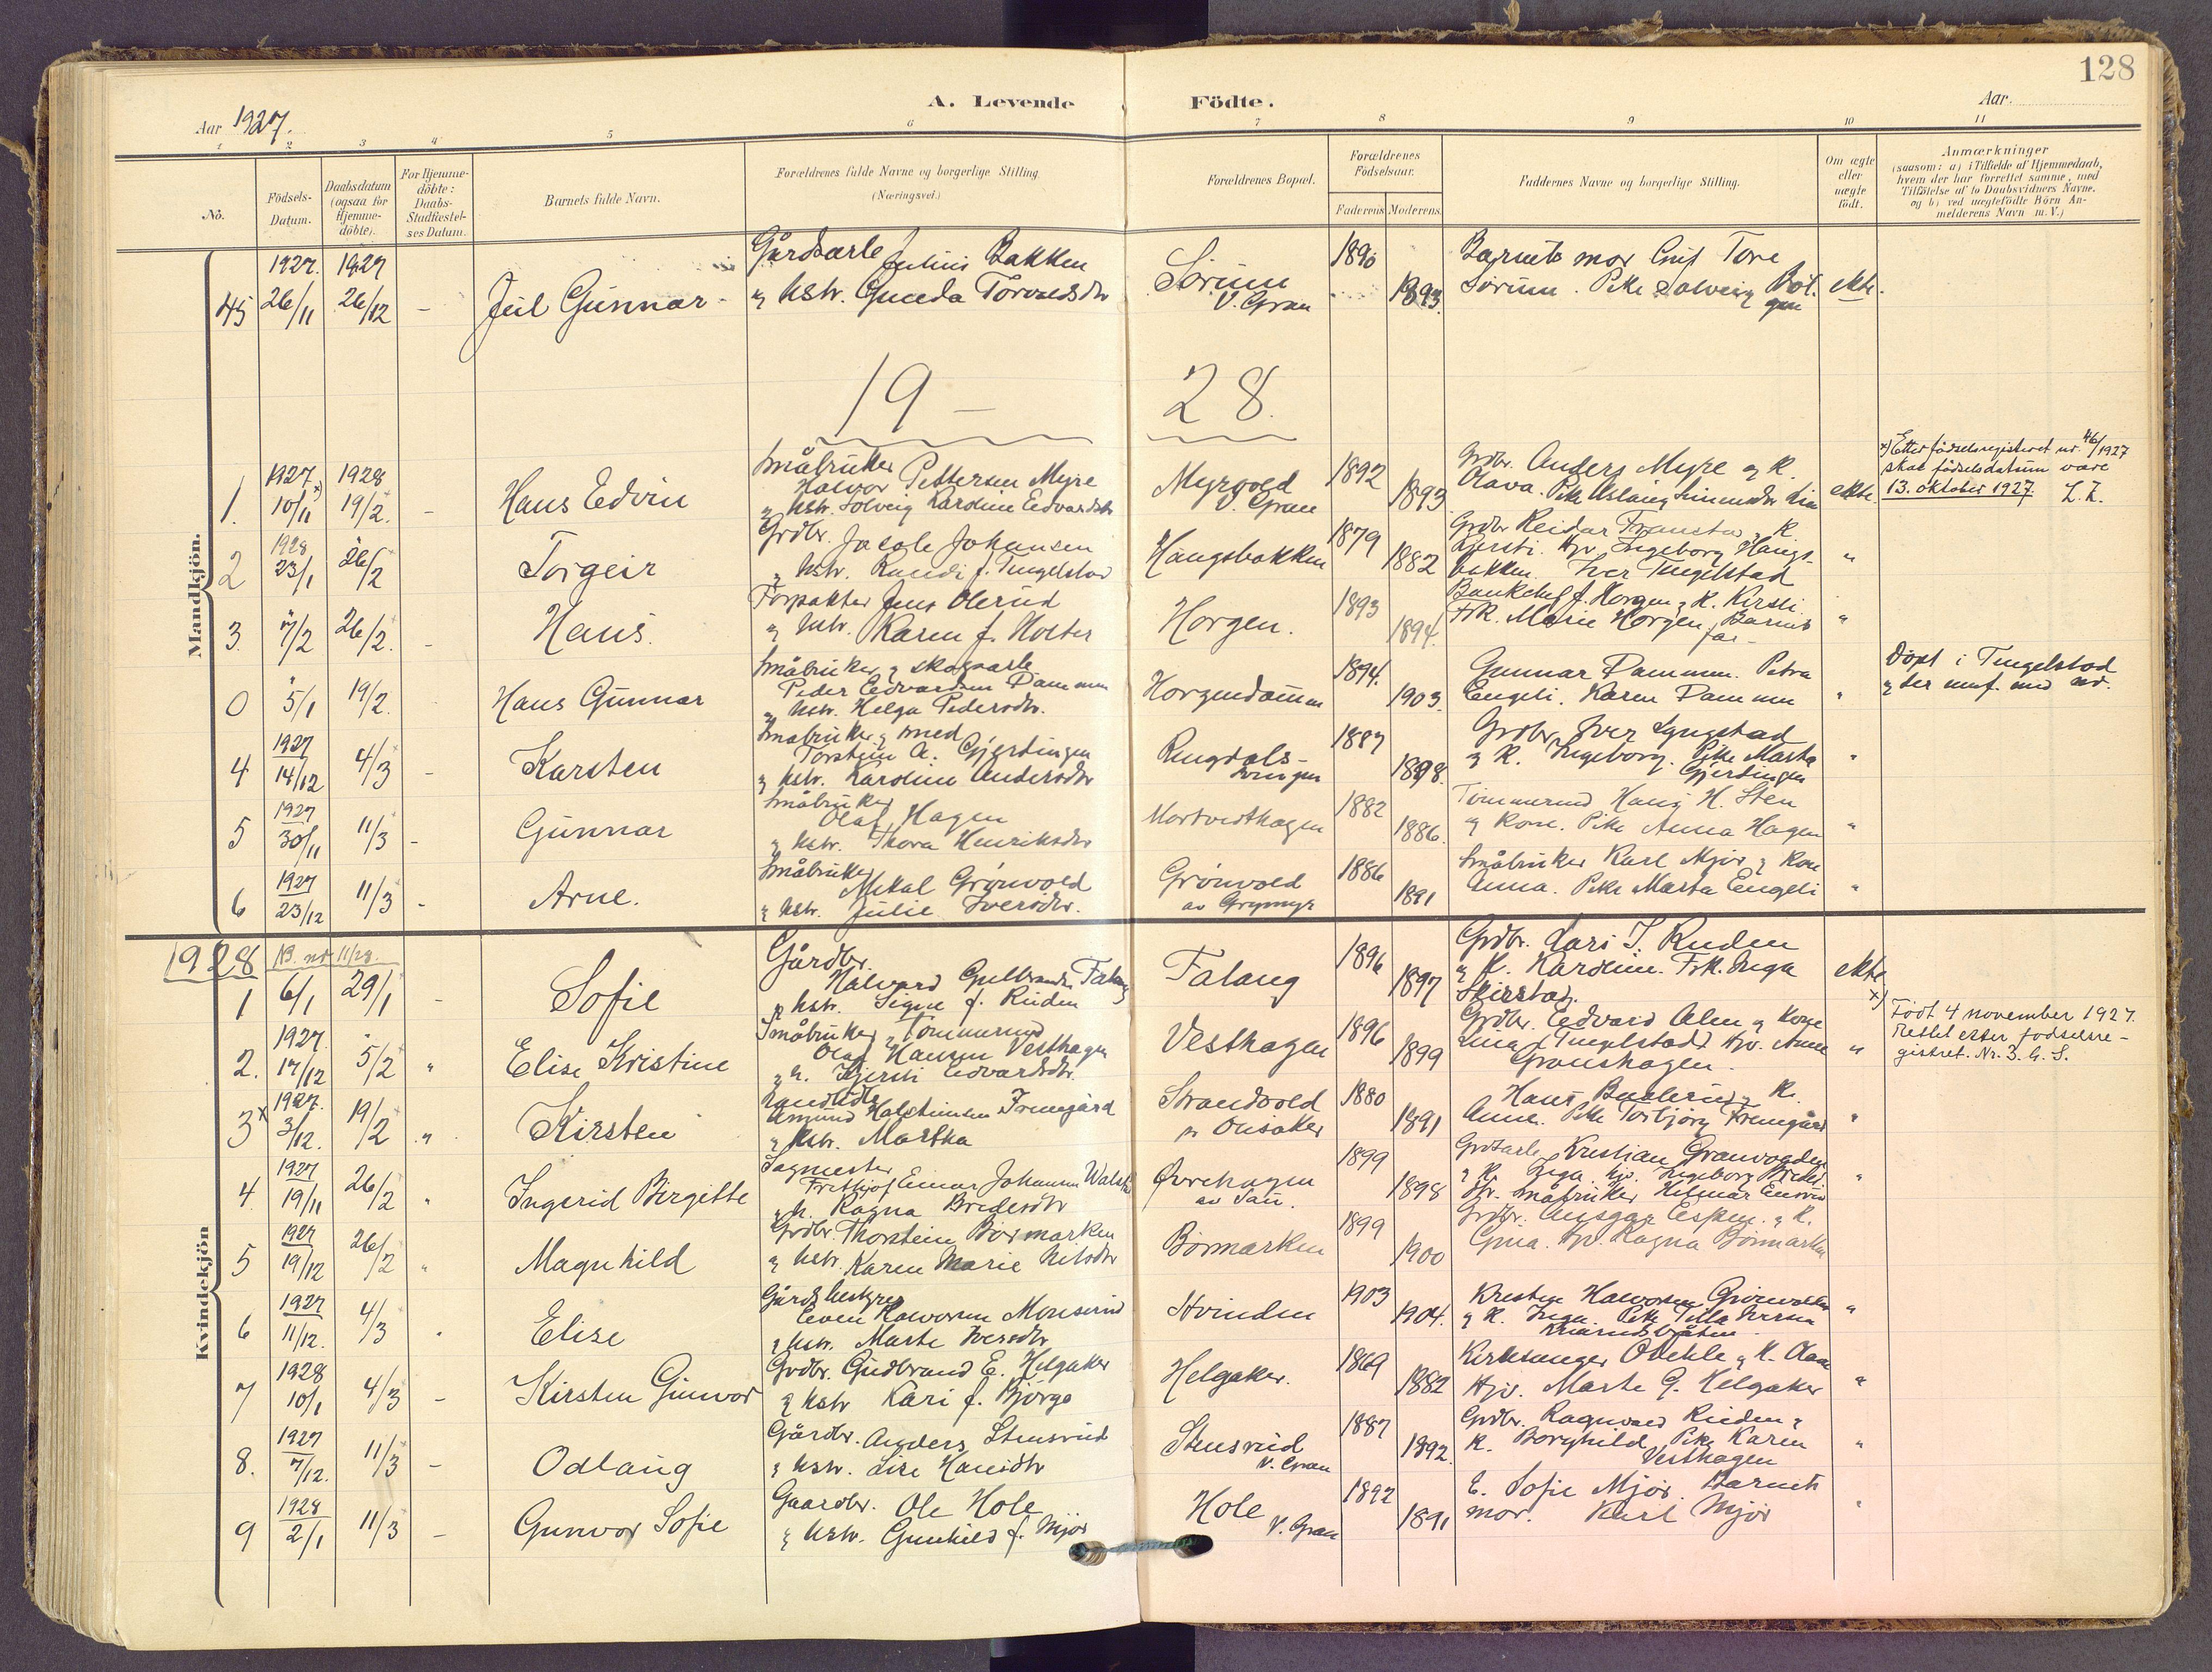 SAH, Gran prestekontor, Ministerialbok nr. 21, 1908-1932, s. 128